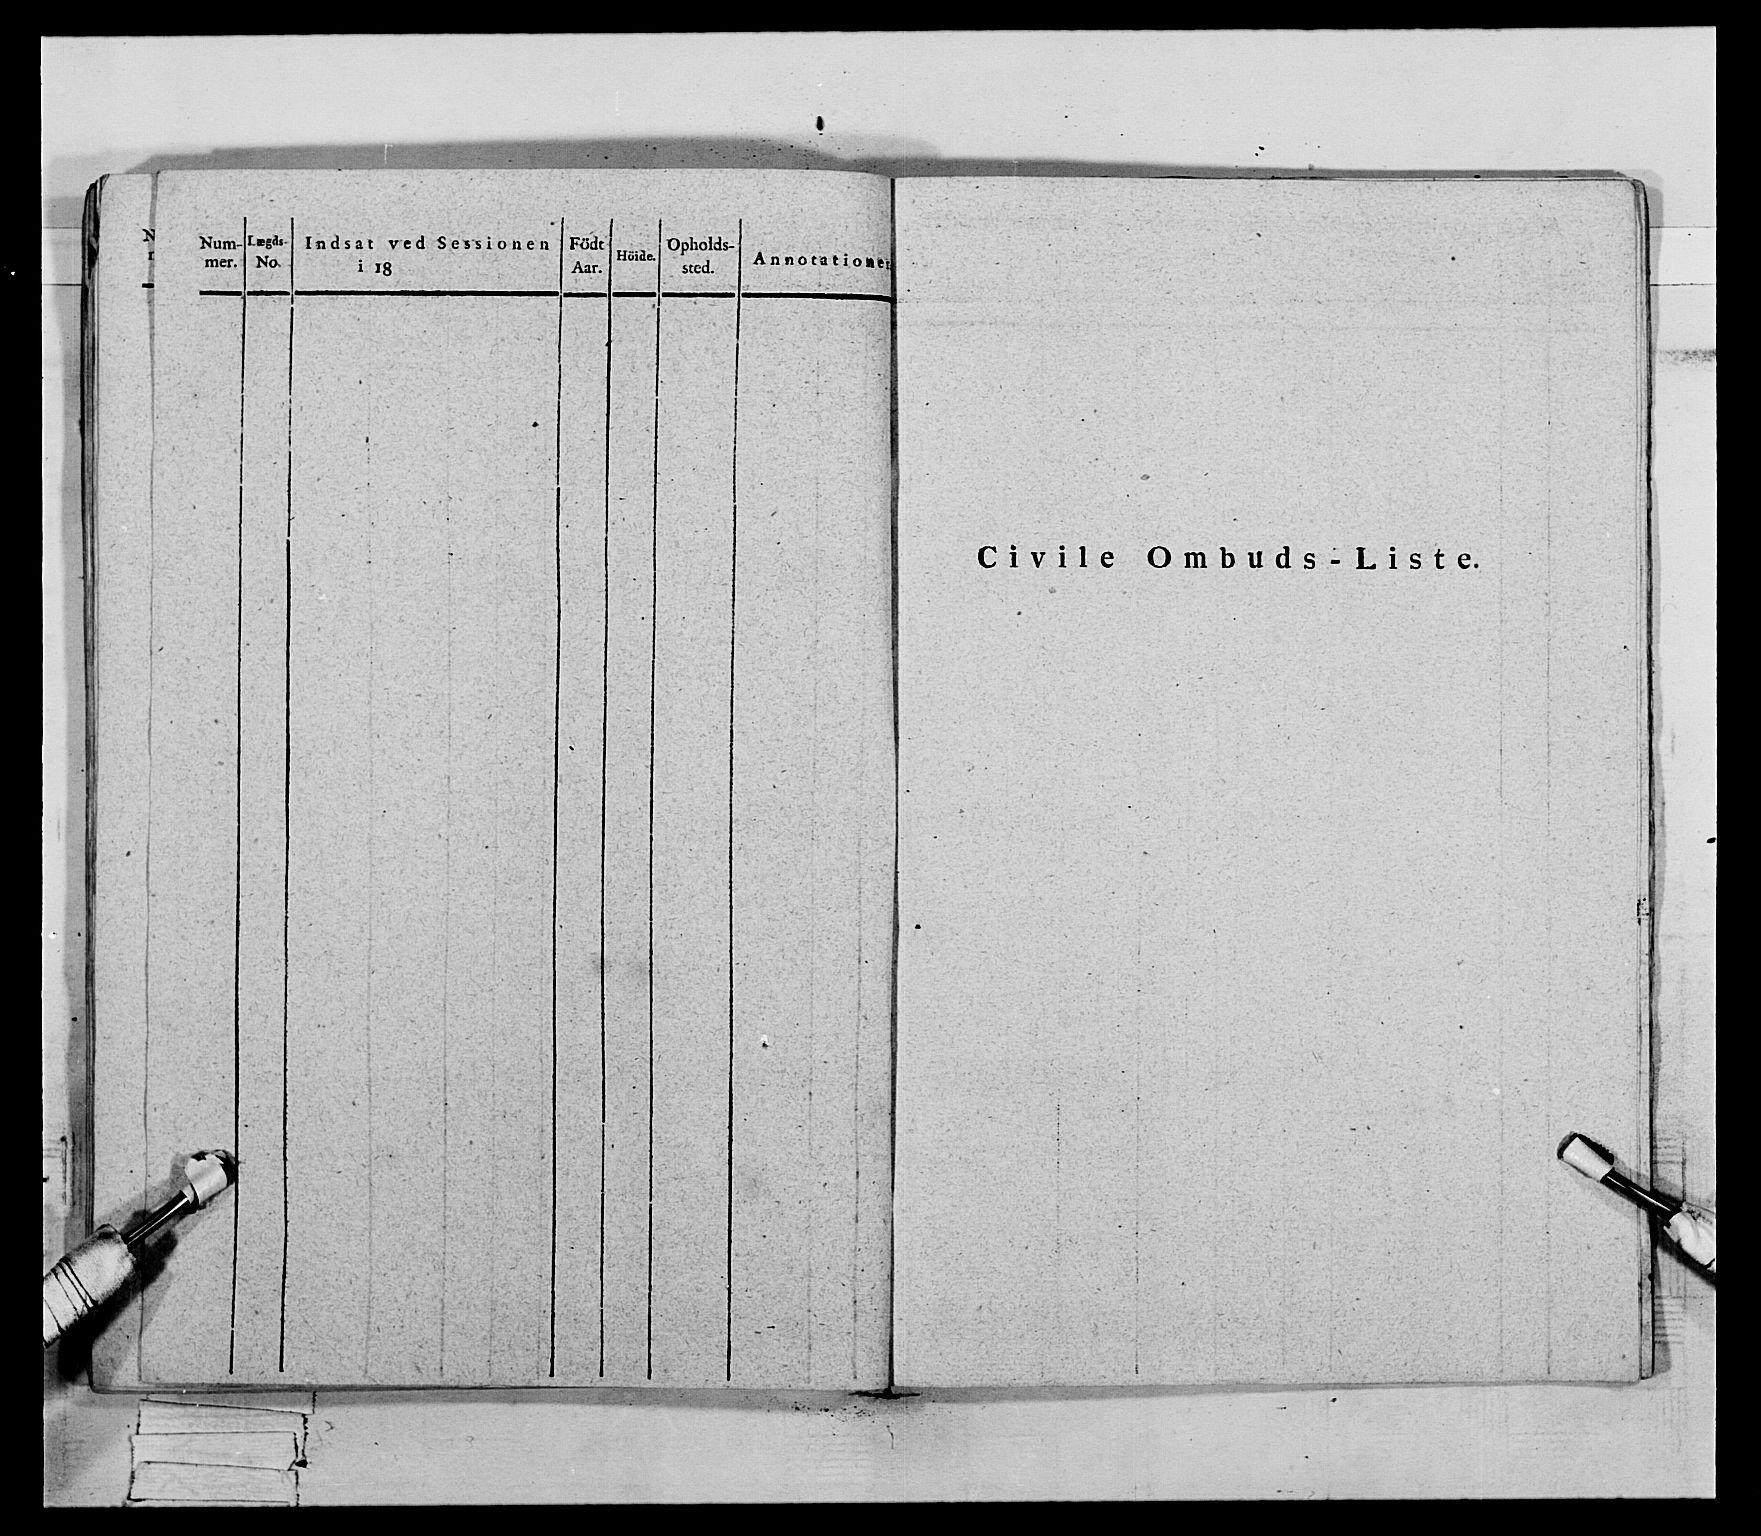 RA, Generalitets- og kommissariatskollegiet, Det kongelige norske kommissariatskollegium, E/Eh/L0069: Opplandske gevorbne infanteriregiment, 1810-1818, s. 659